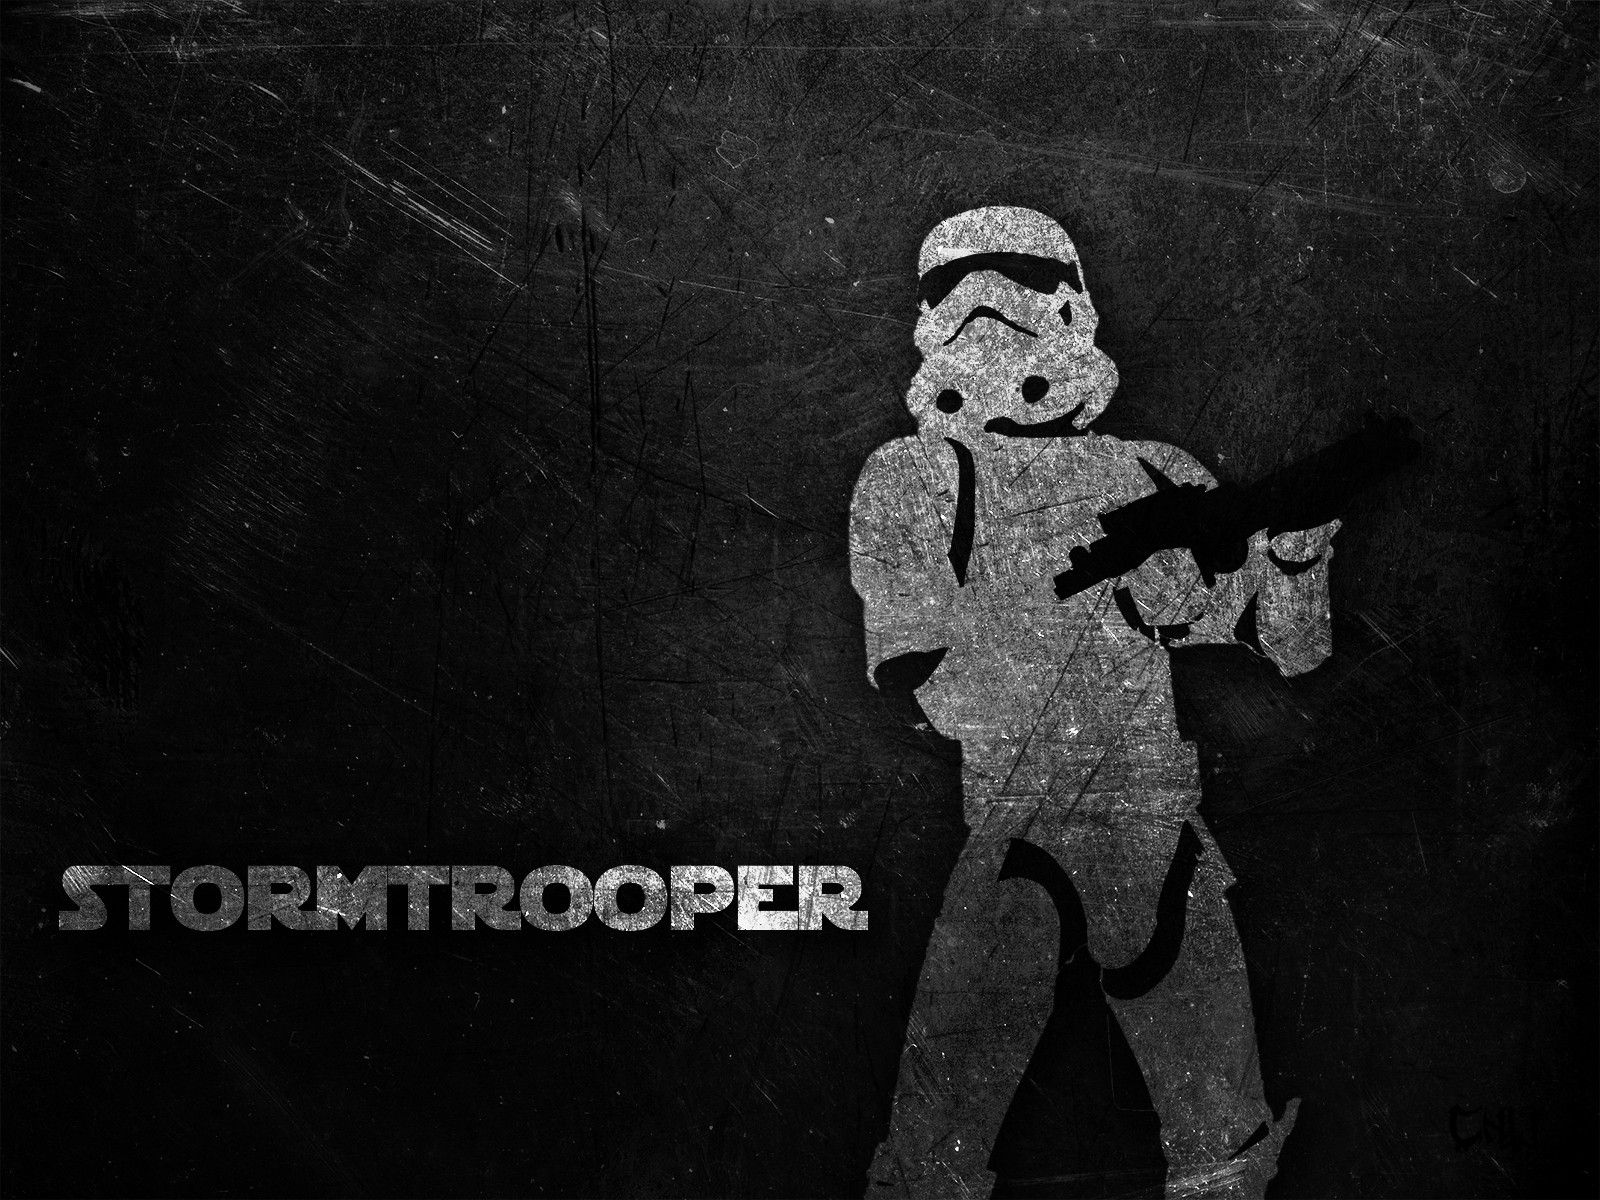 Luxury Star Wars Stormtrooper Wallpaper Star Wars Wallpaper Star Wars Tattoo Small Stormtrooper